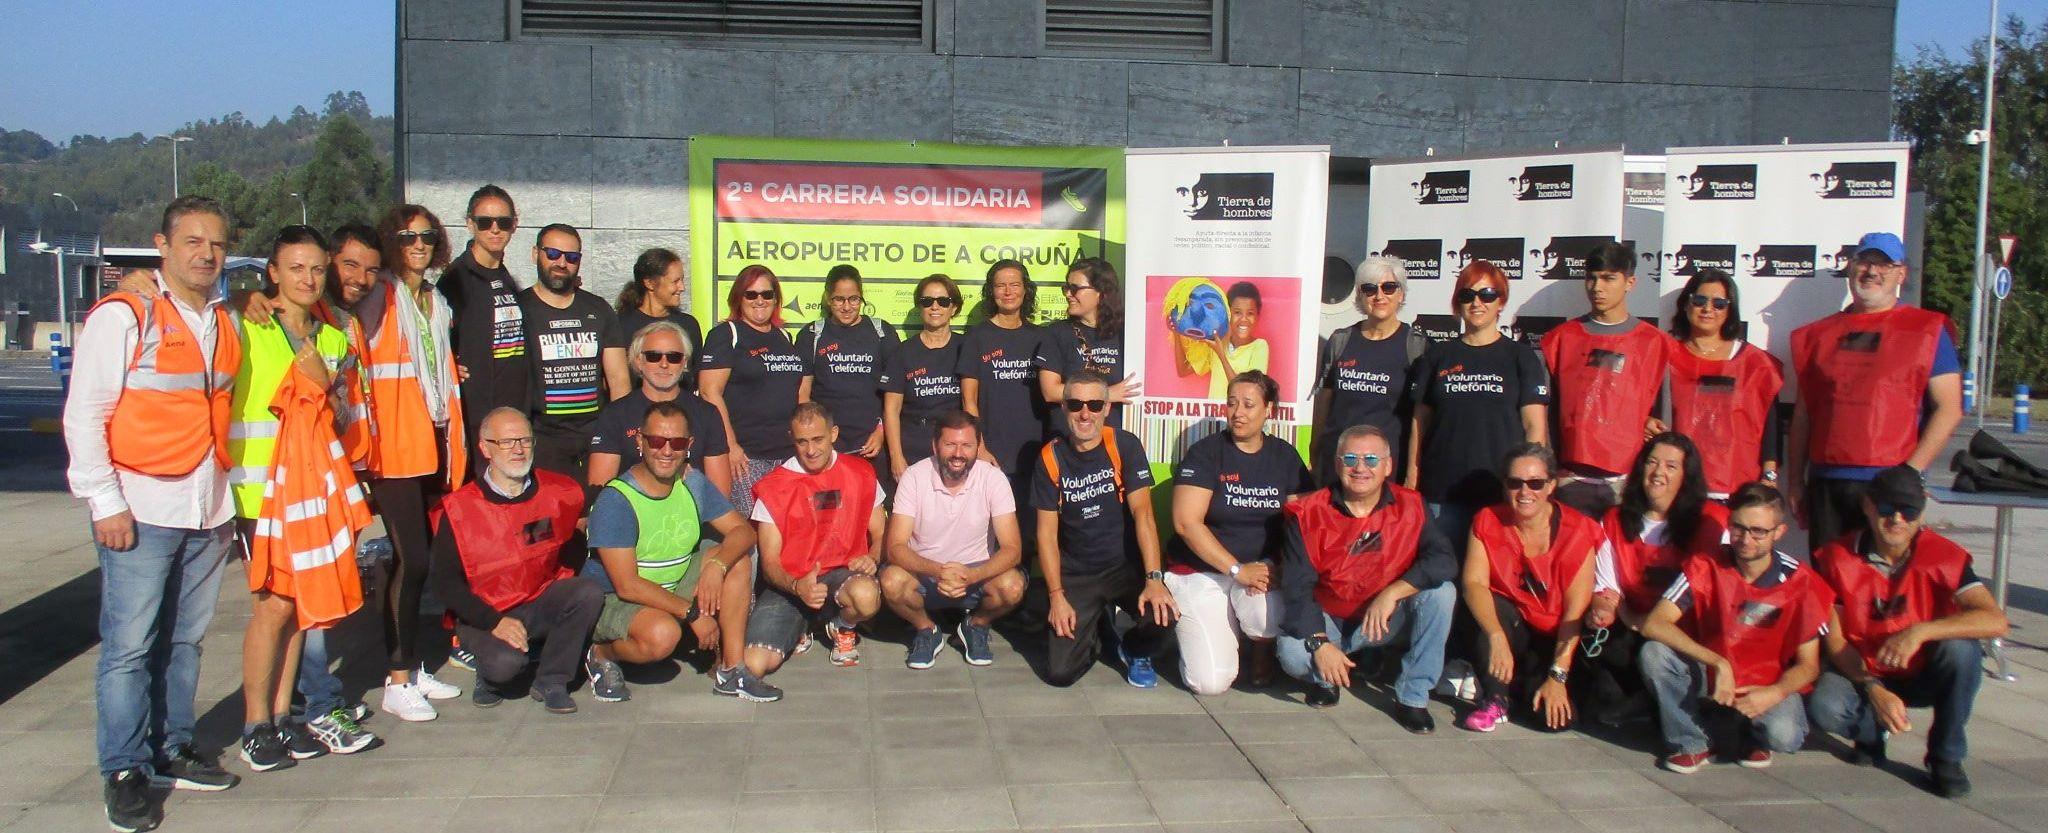 fotnot galicia iicarrera aeropuerto grupo ayuda infancia